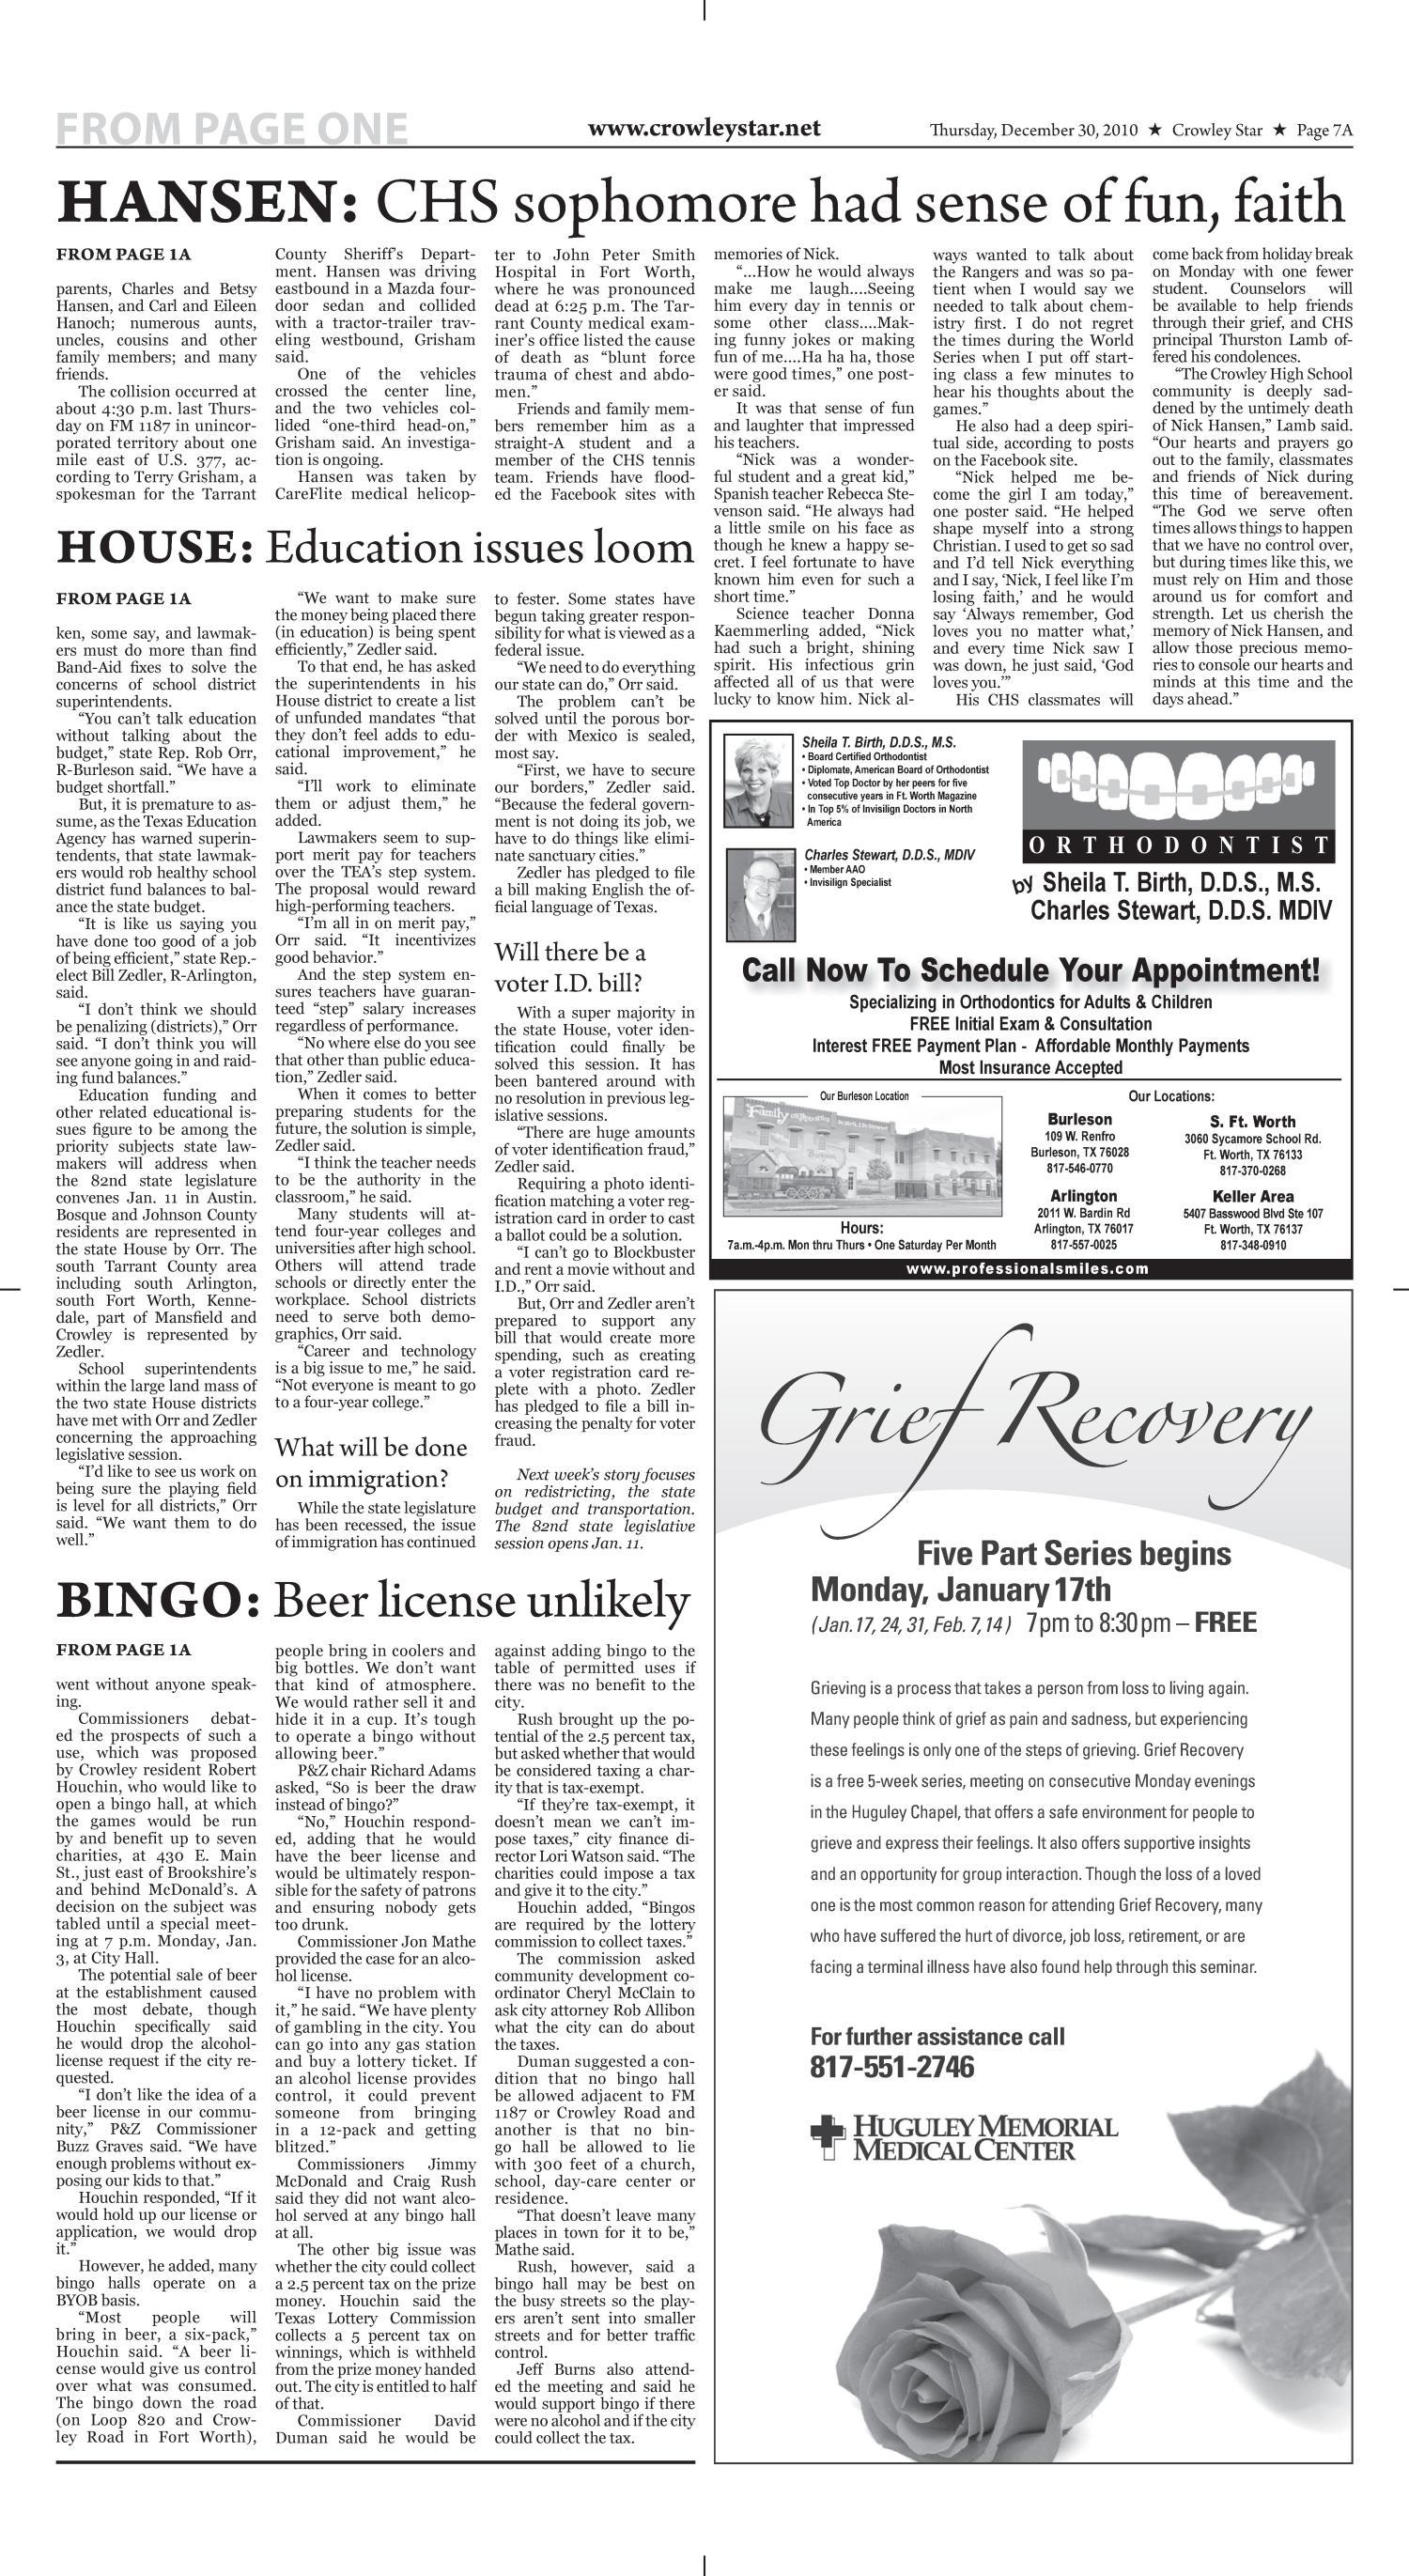 Crowley Star Tex Vol 24 No 38 Ed 1 Thursday December 30 2010